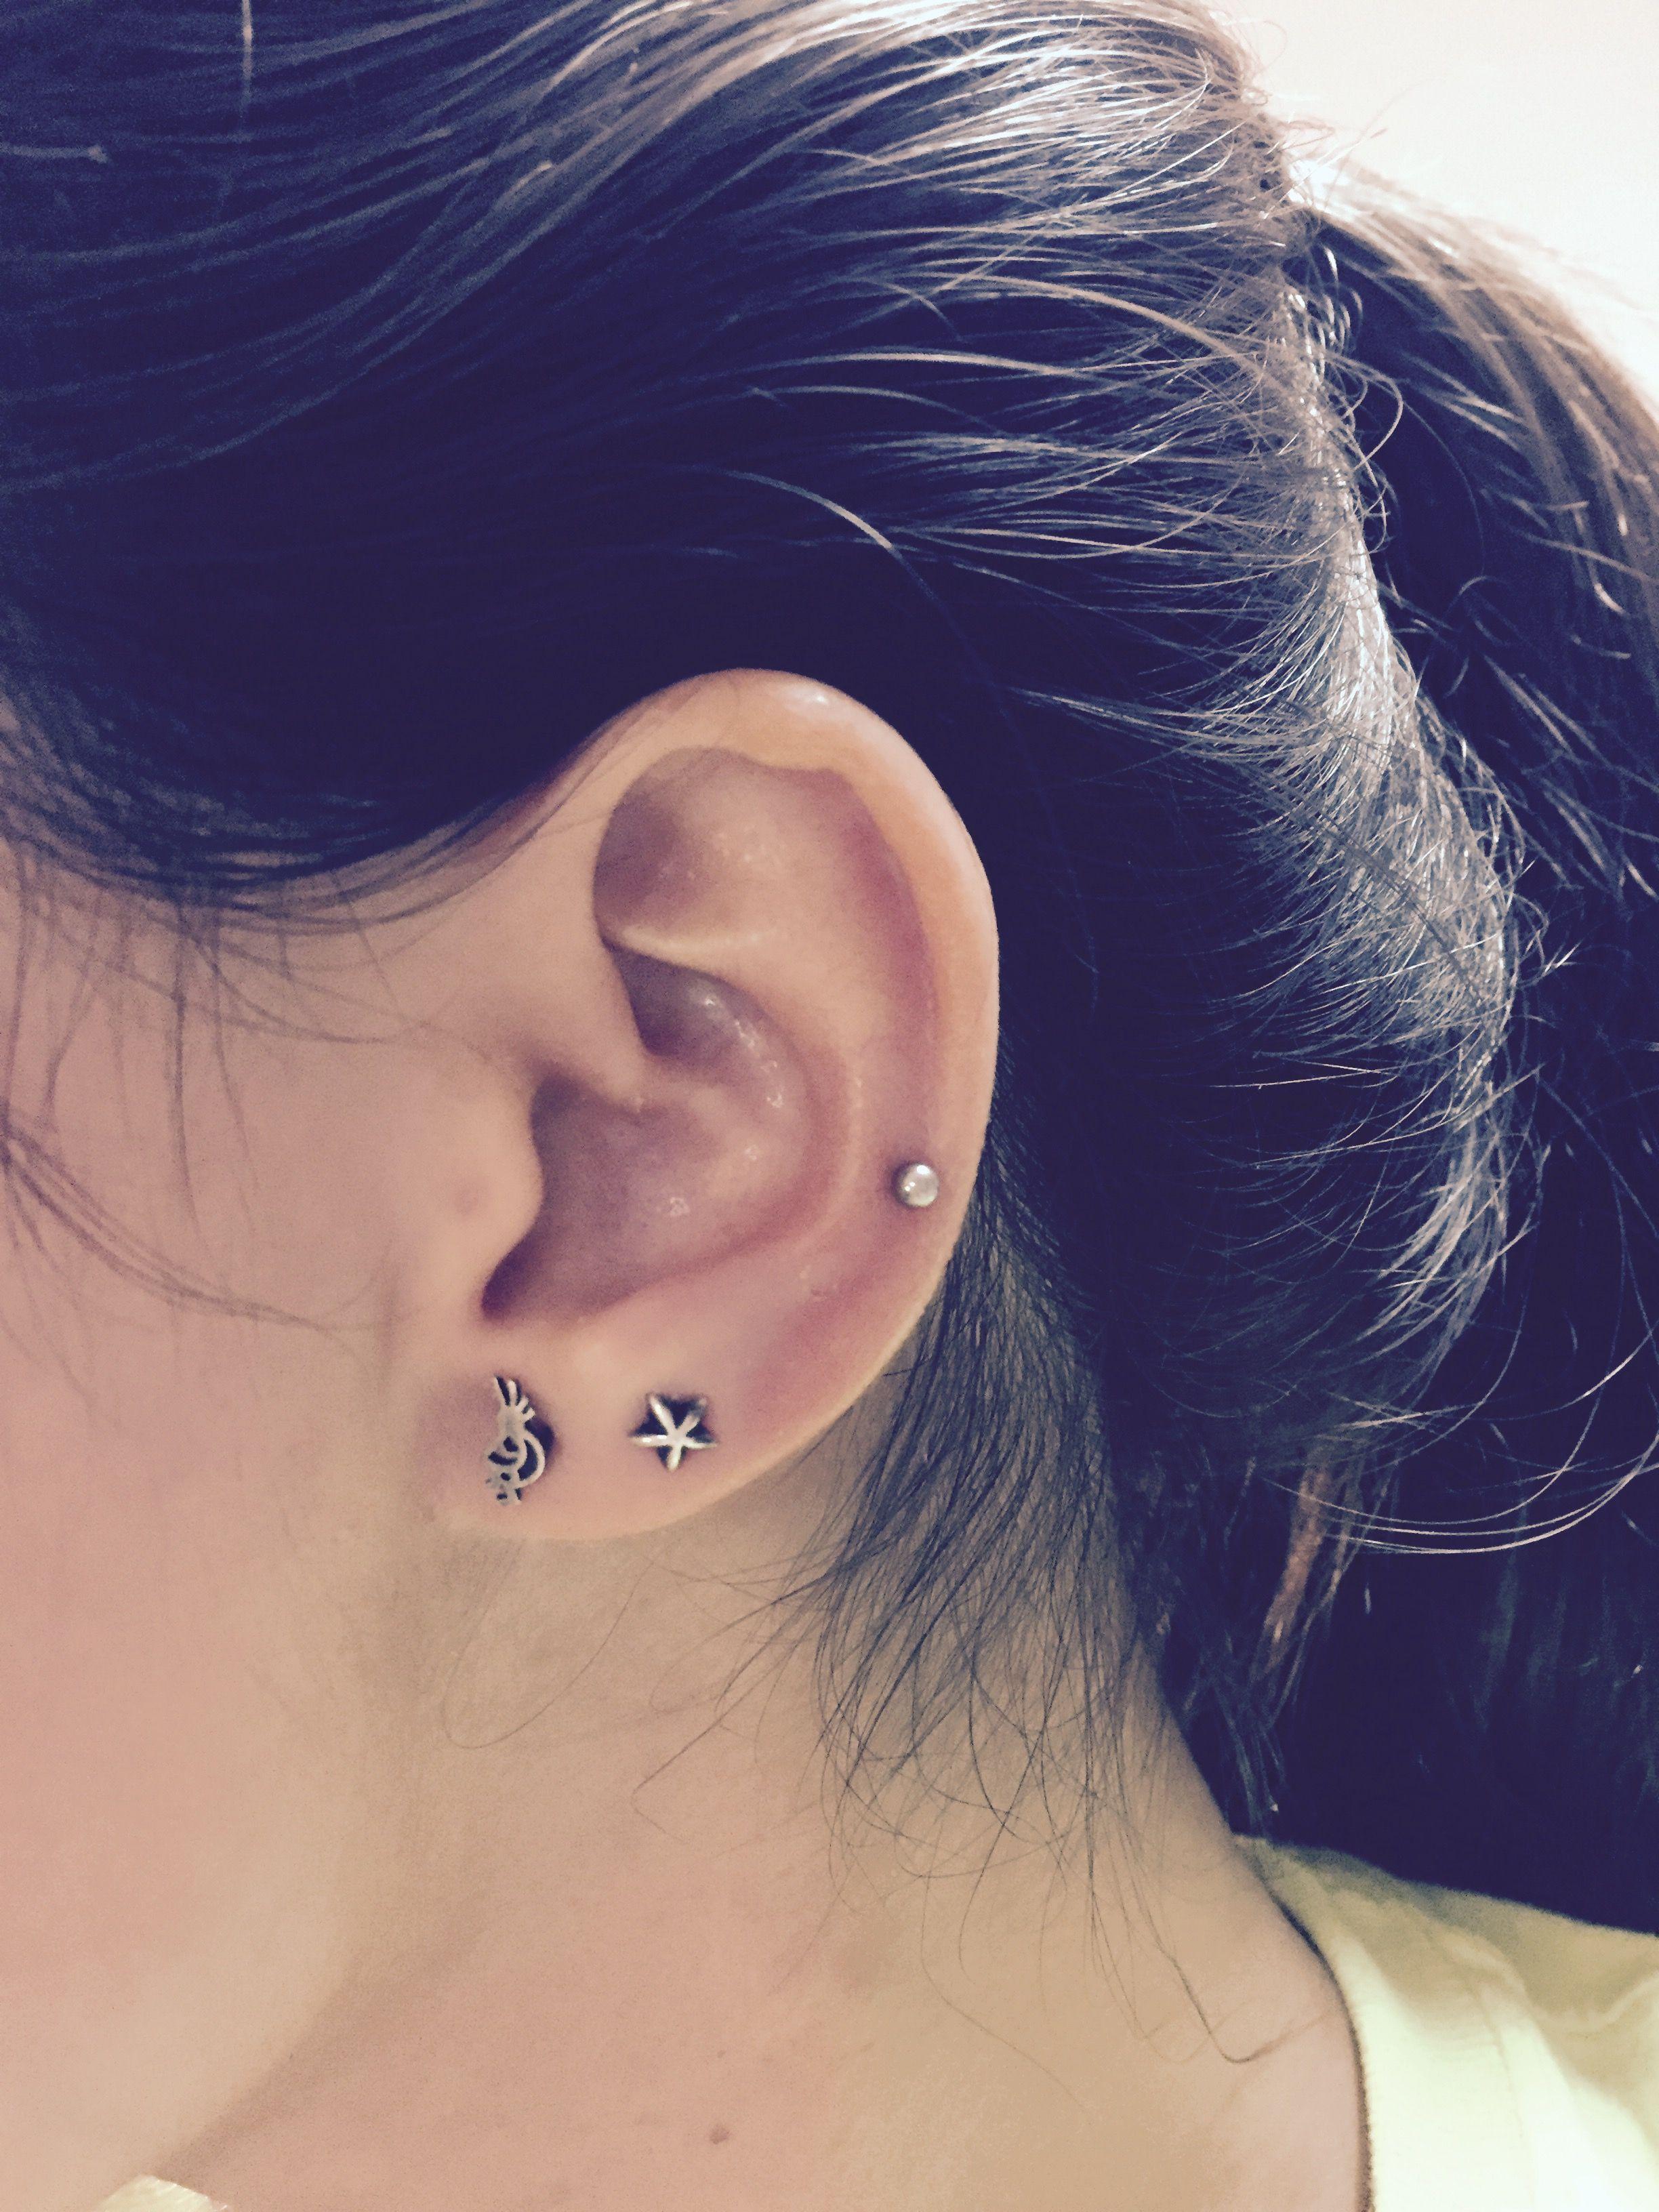 Mid Cartilage Piercing And Double Earlobe Heart Earrings Studs